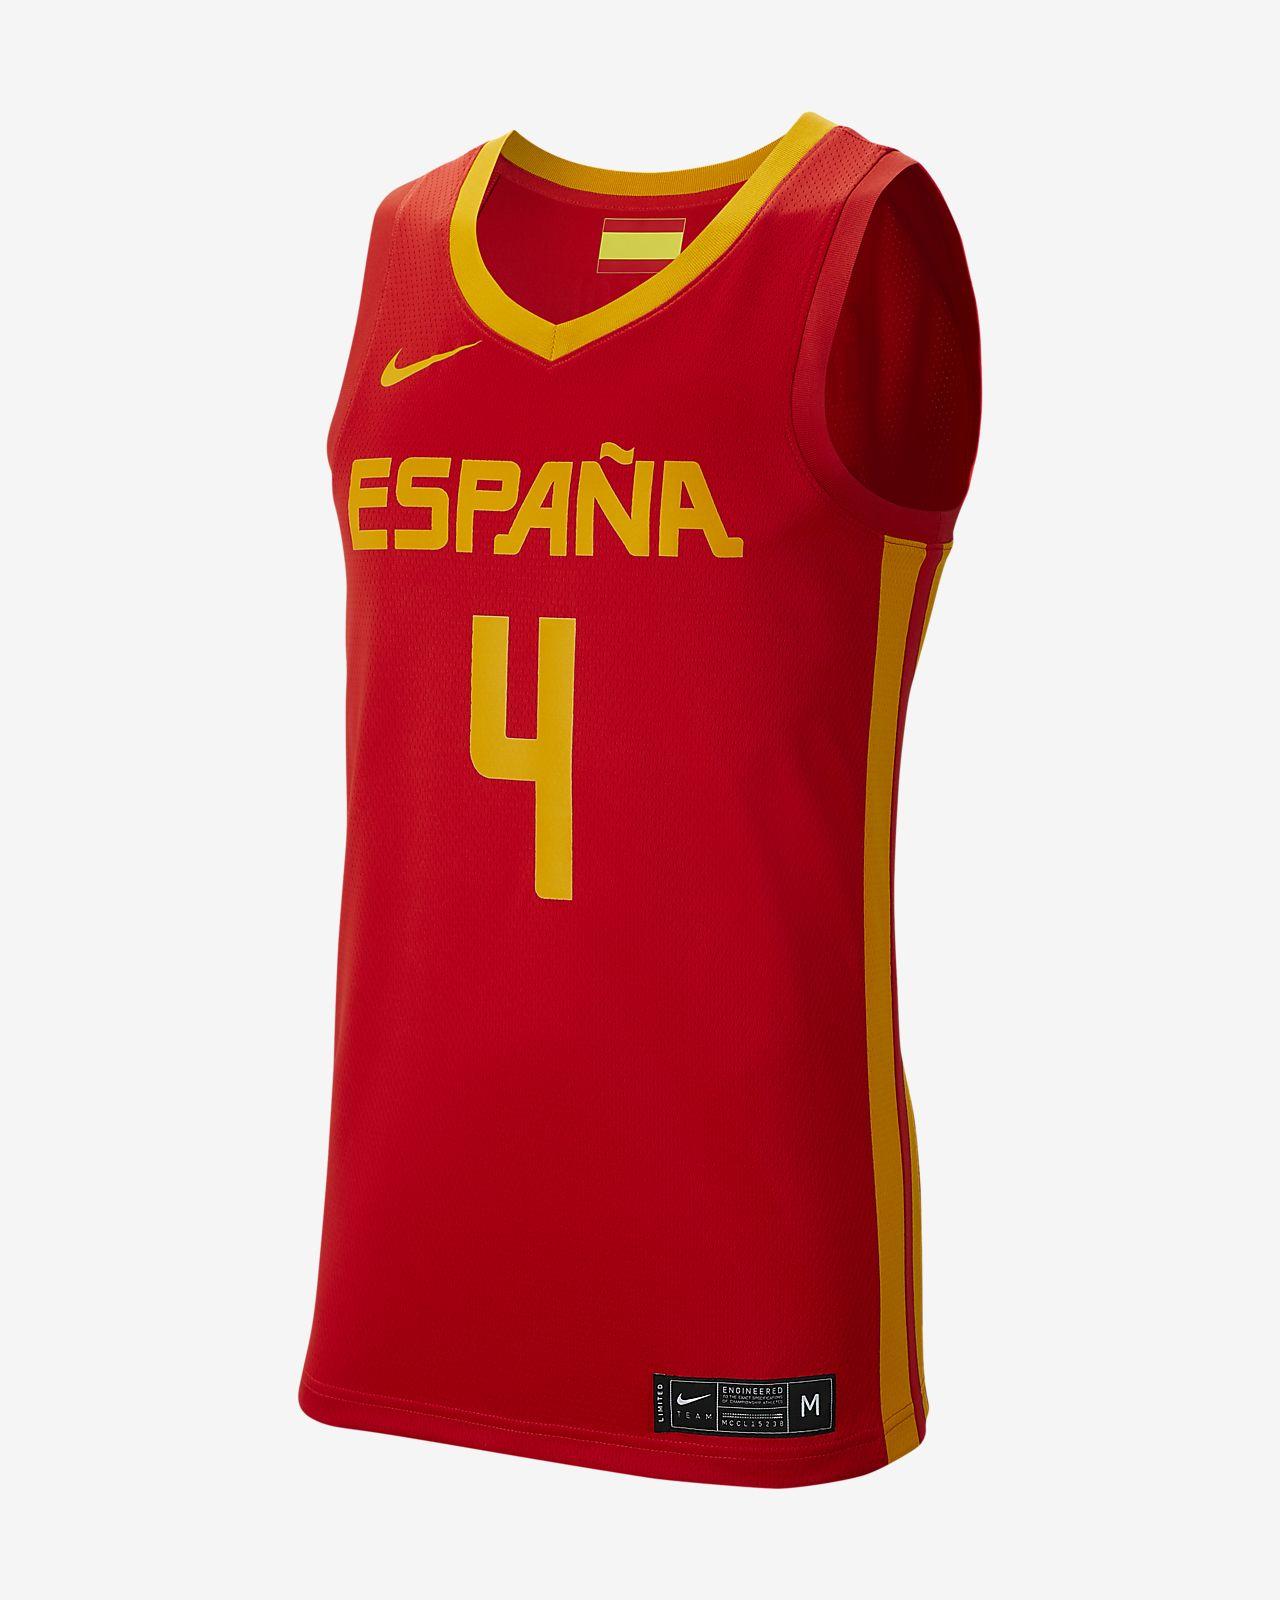 Baloncesto NikeroadCamiseta Hombre Spain De Spain rCoshdQBtx